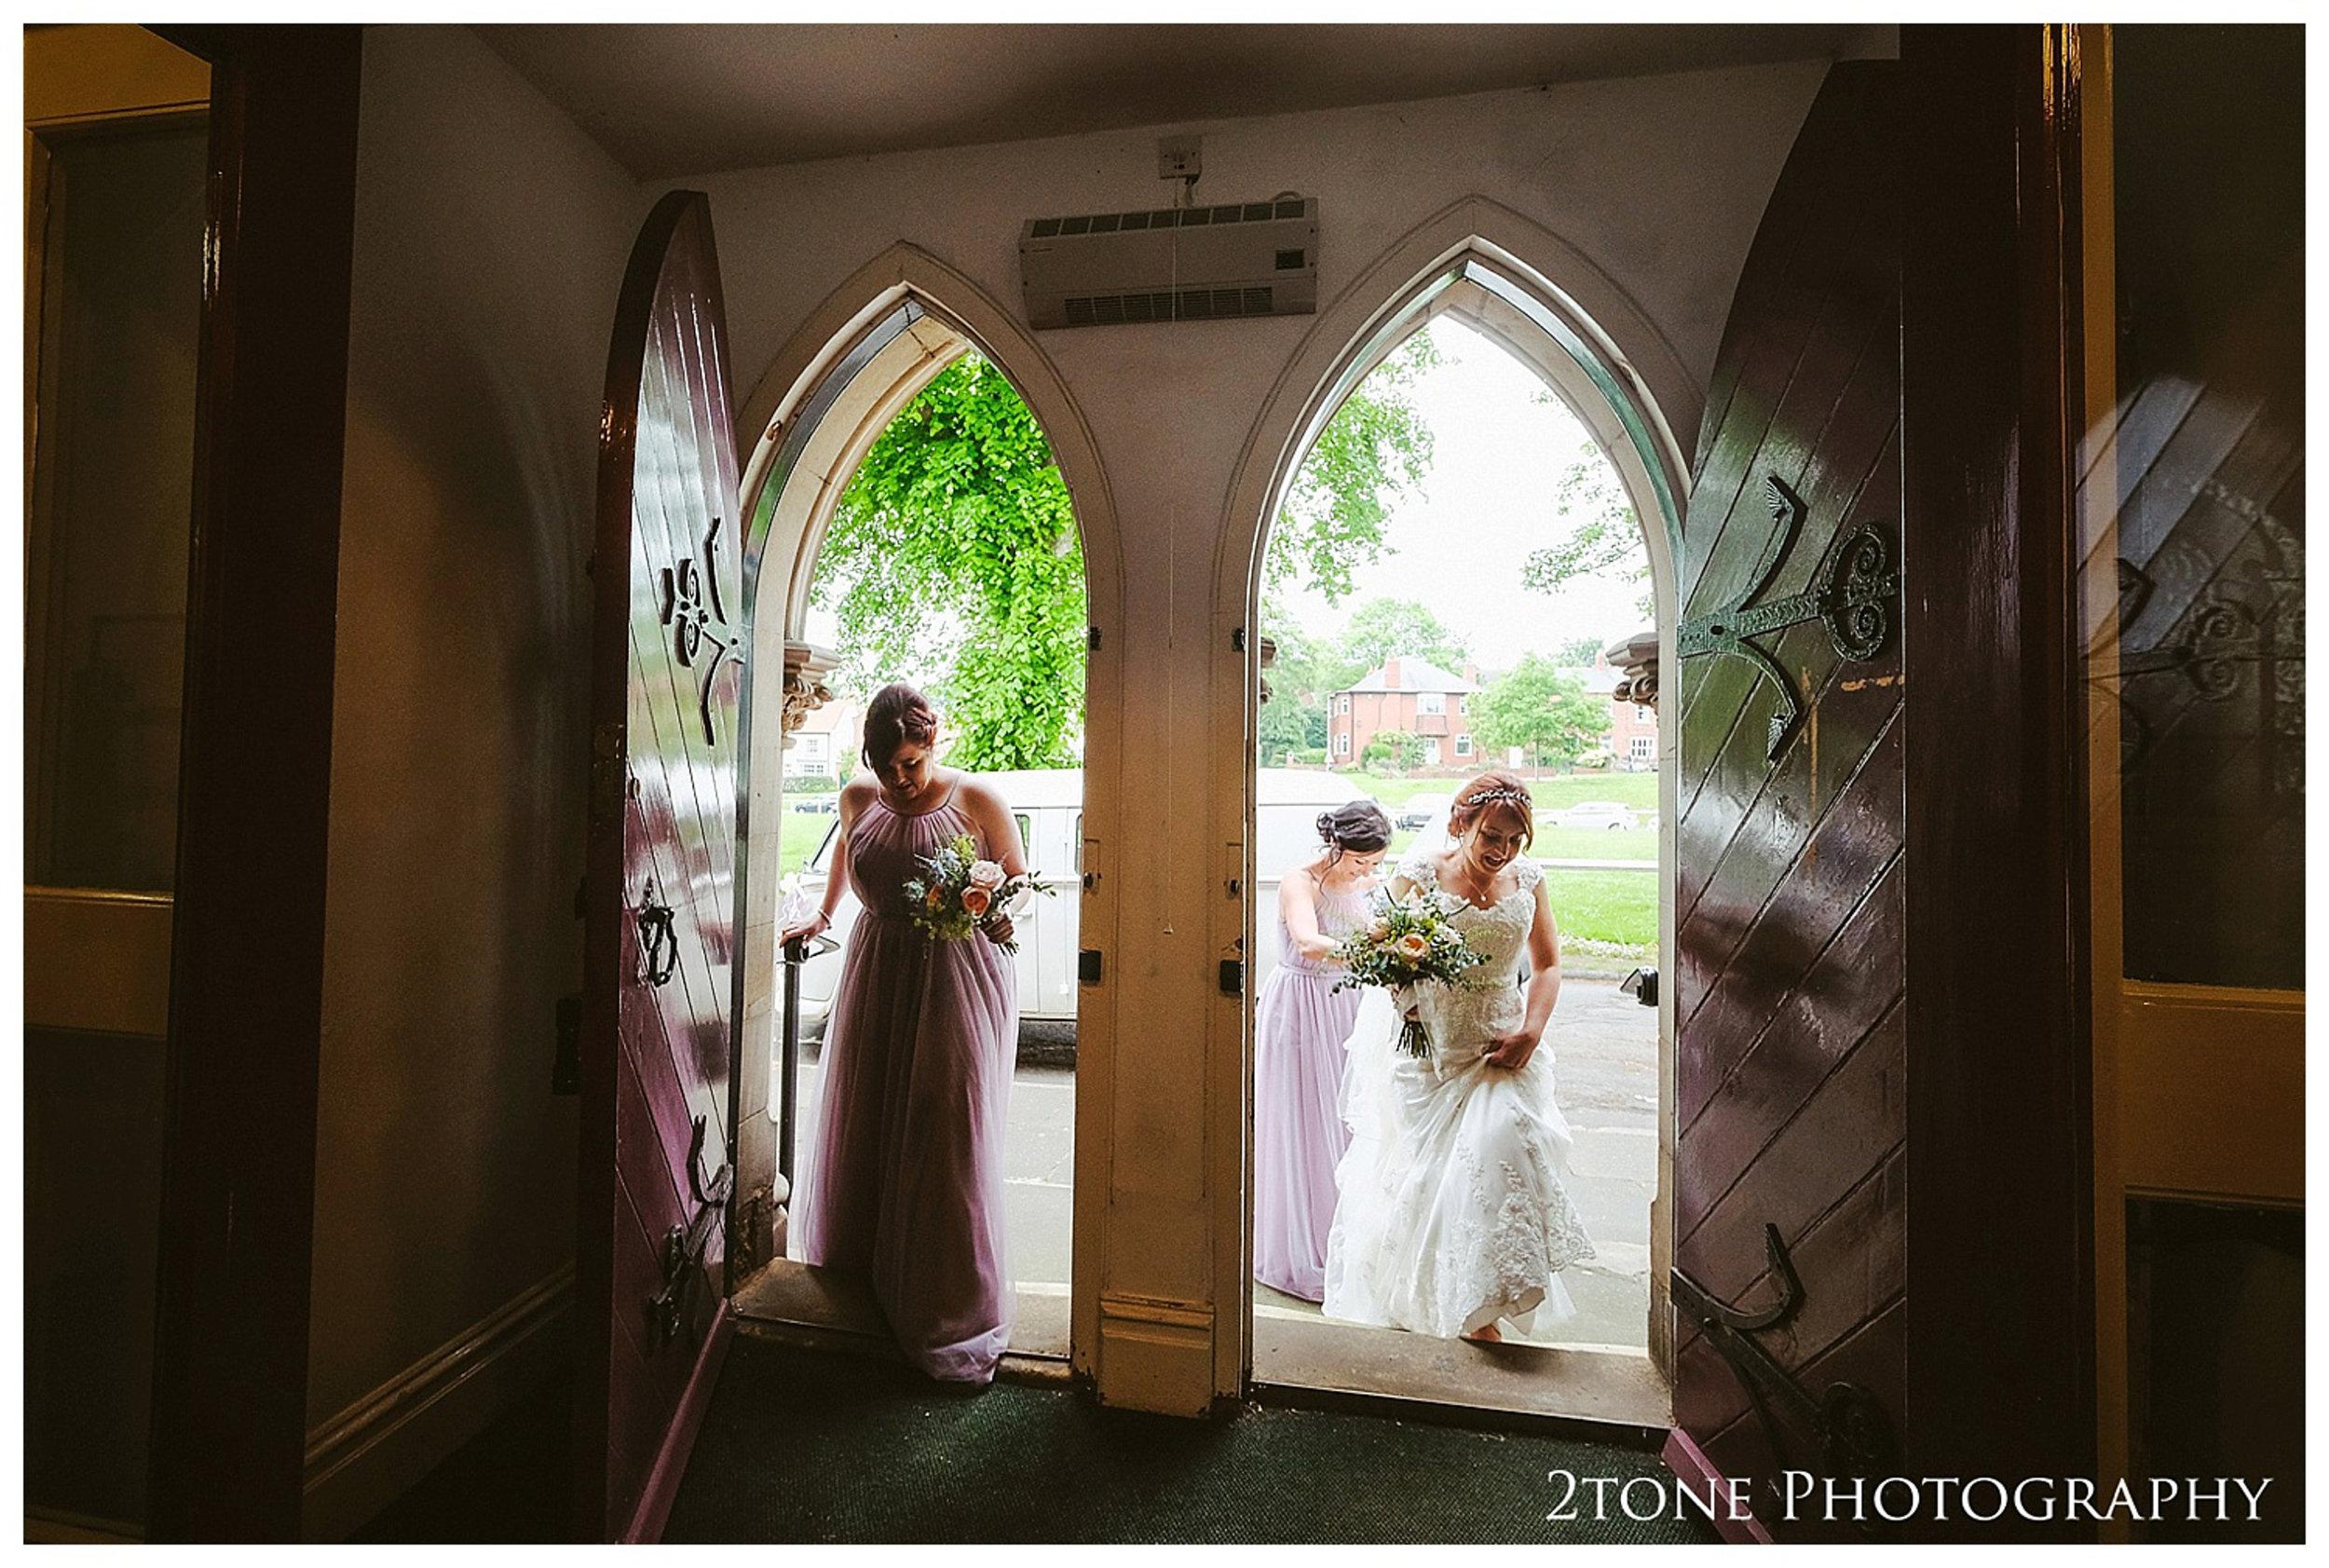 2tone Photography LTD